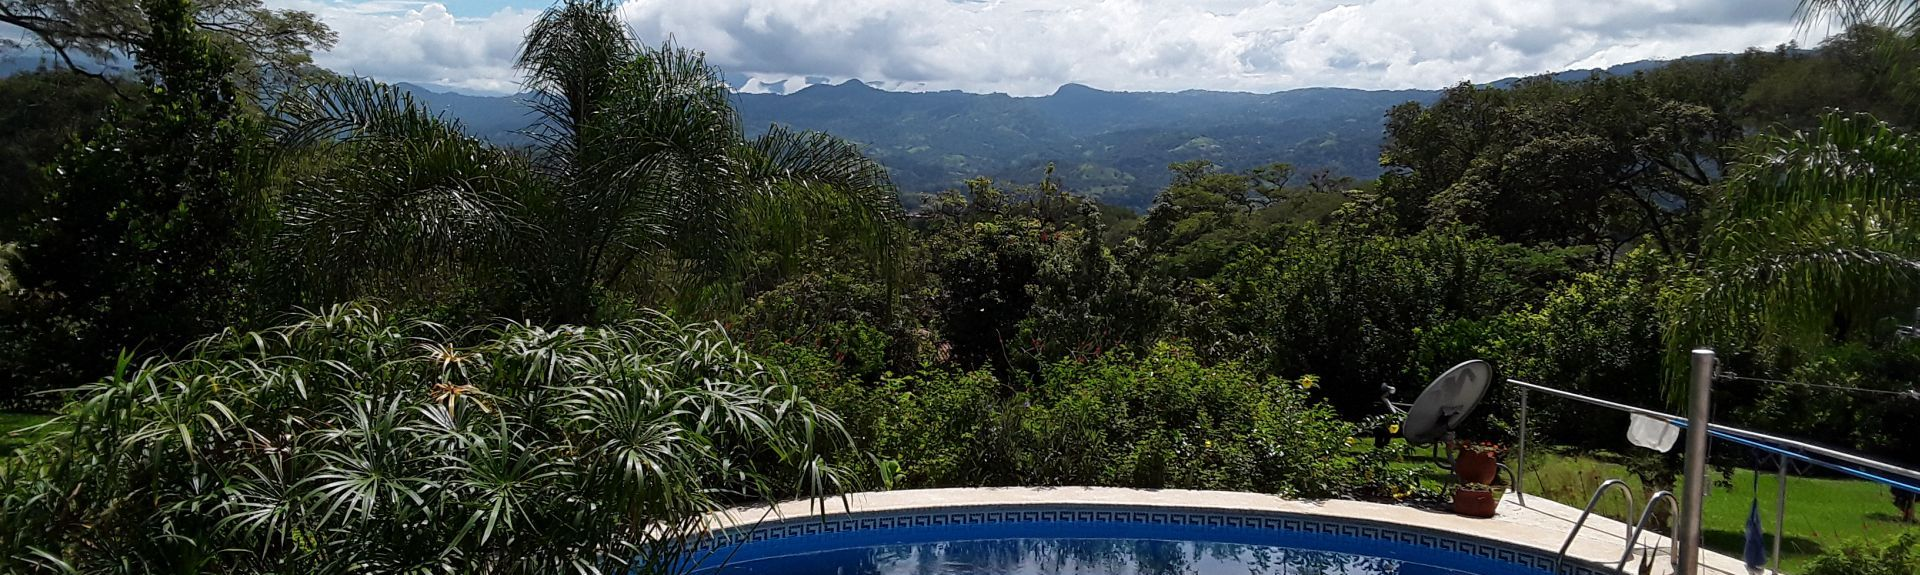 Kanton Atenas, Alajuela (provincie), Costa Rica